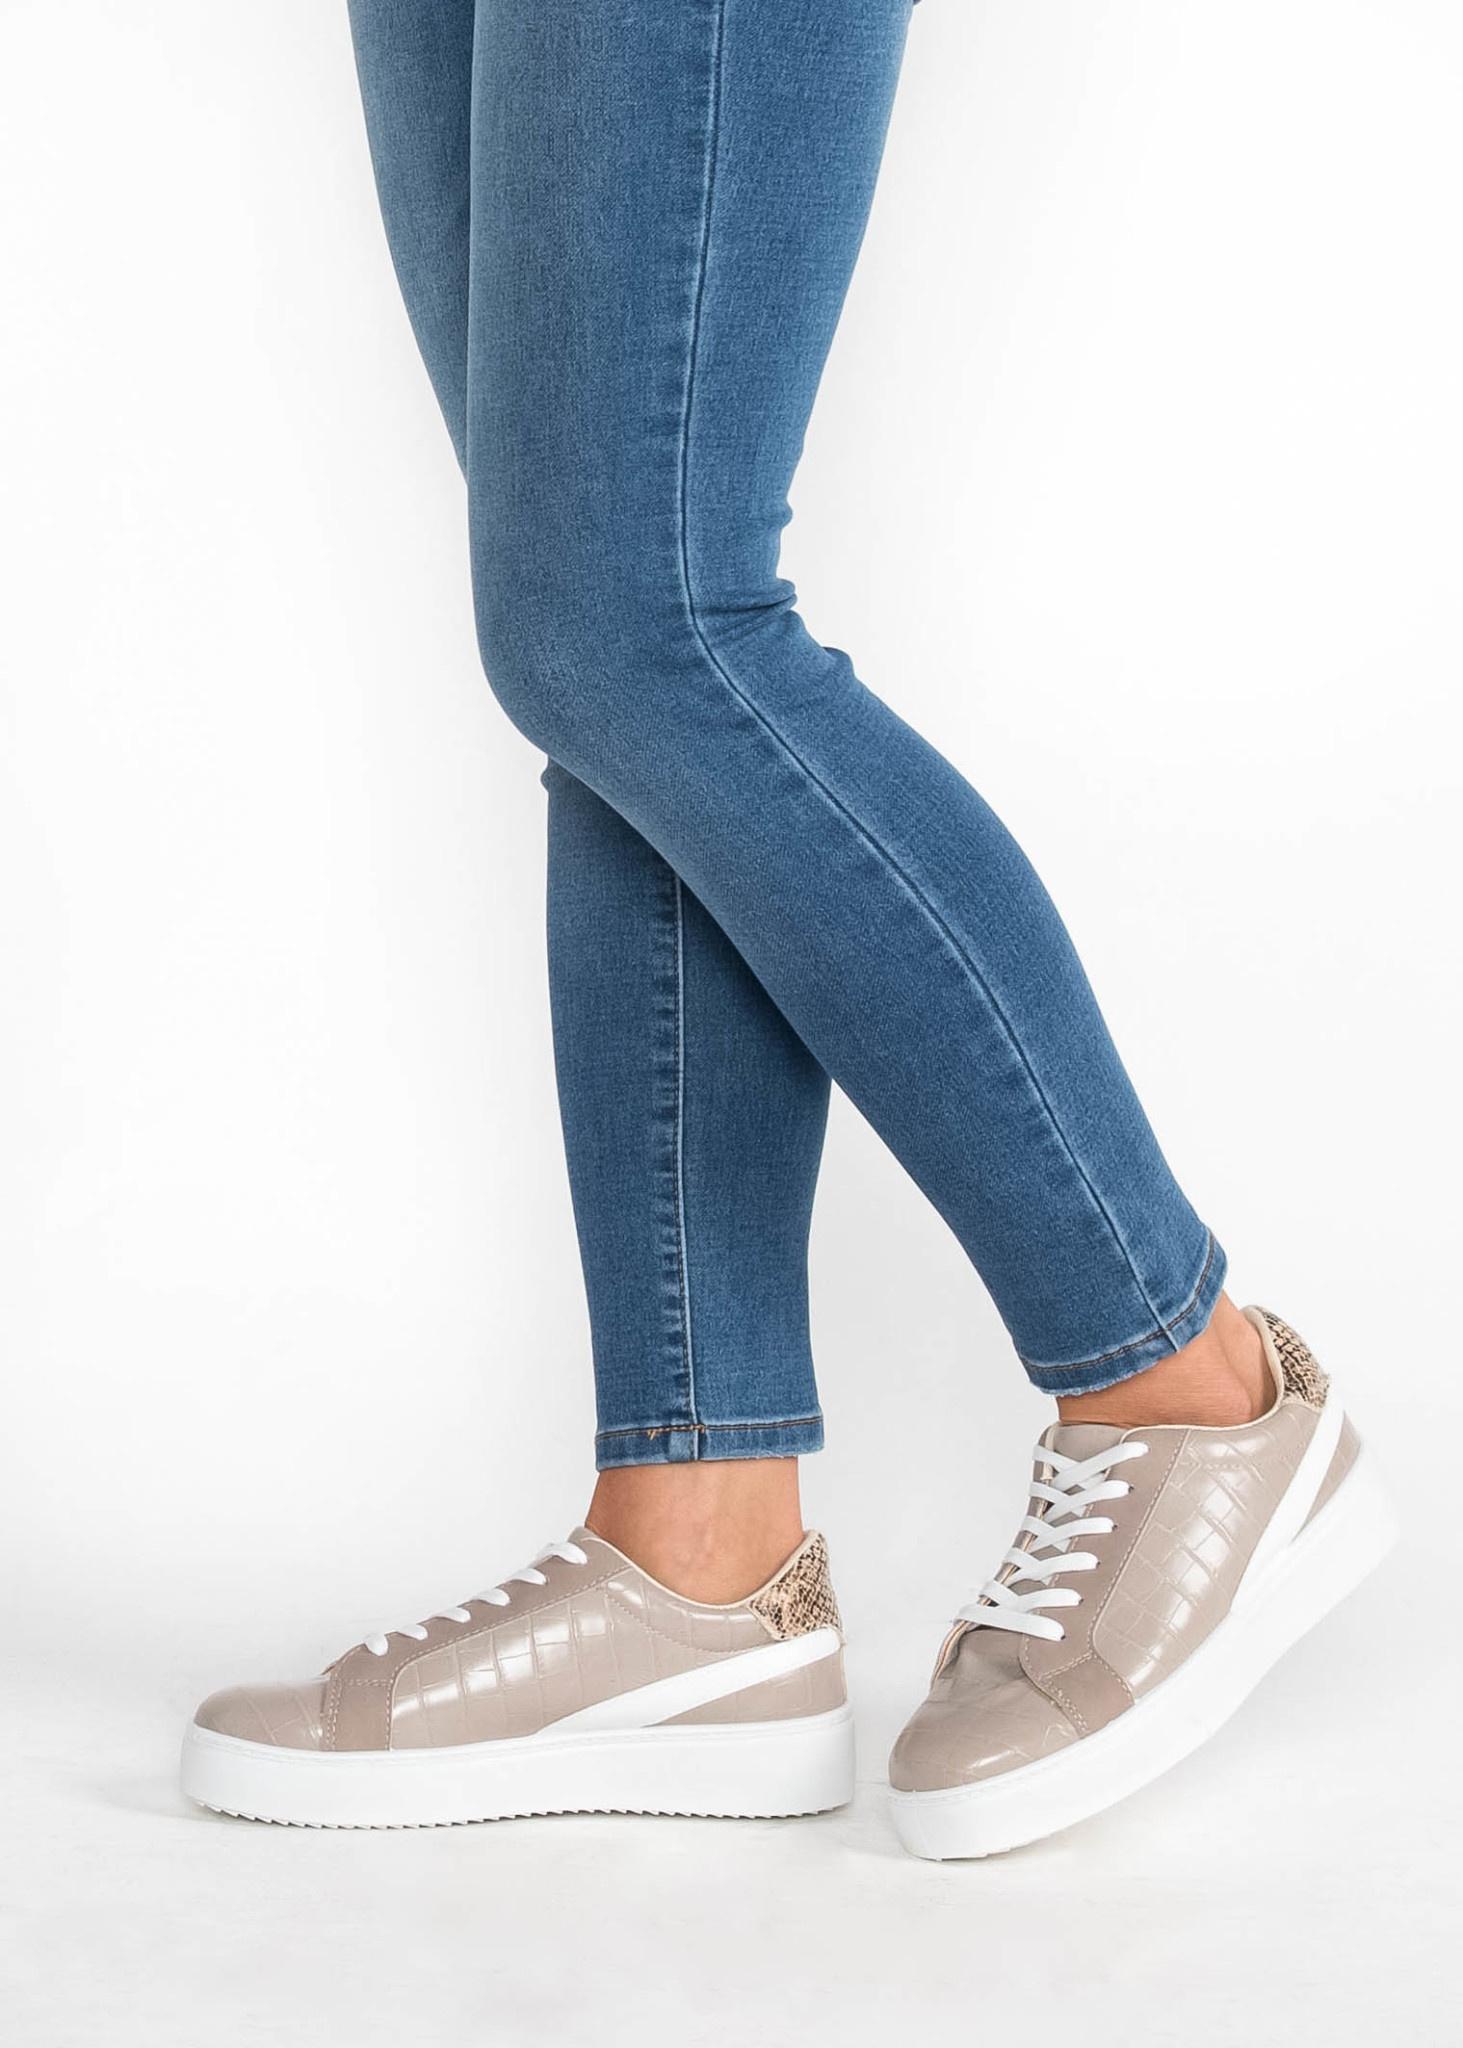 Verona Taupe Platform Sneakers | Shop